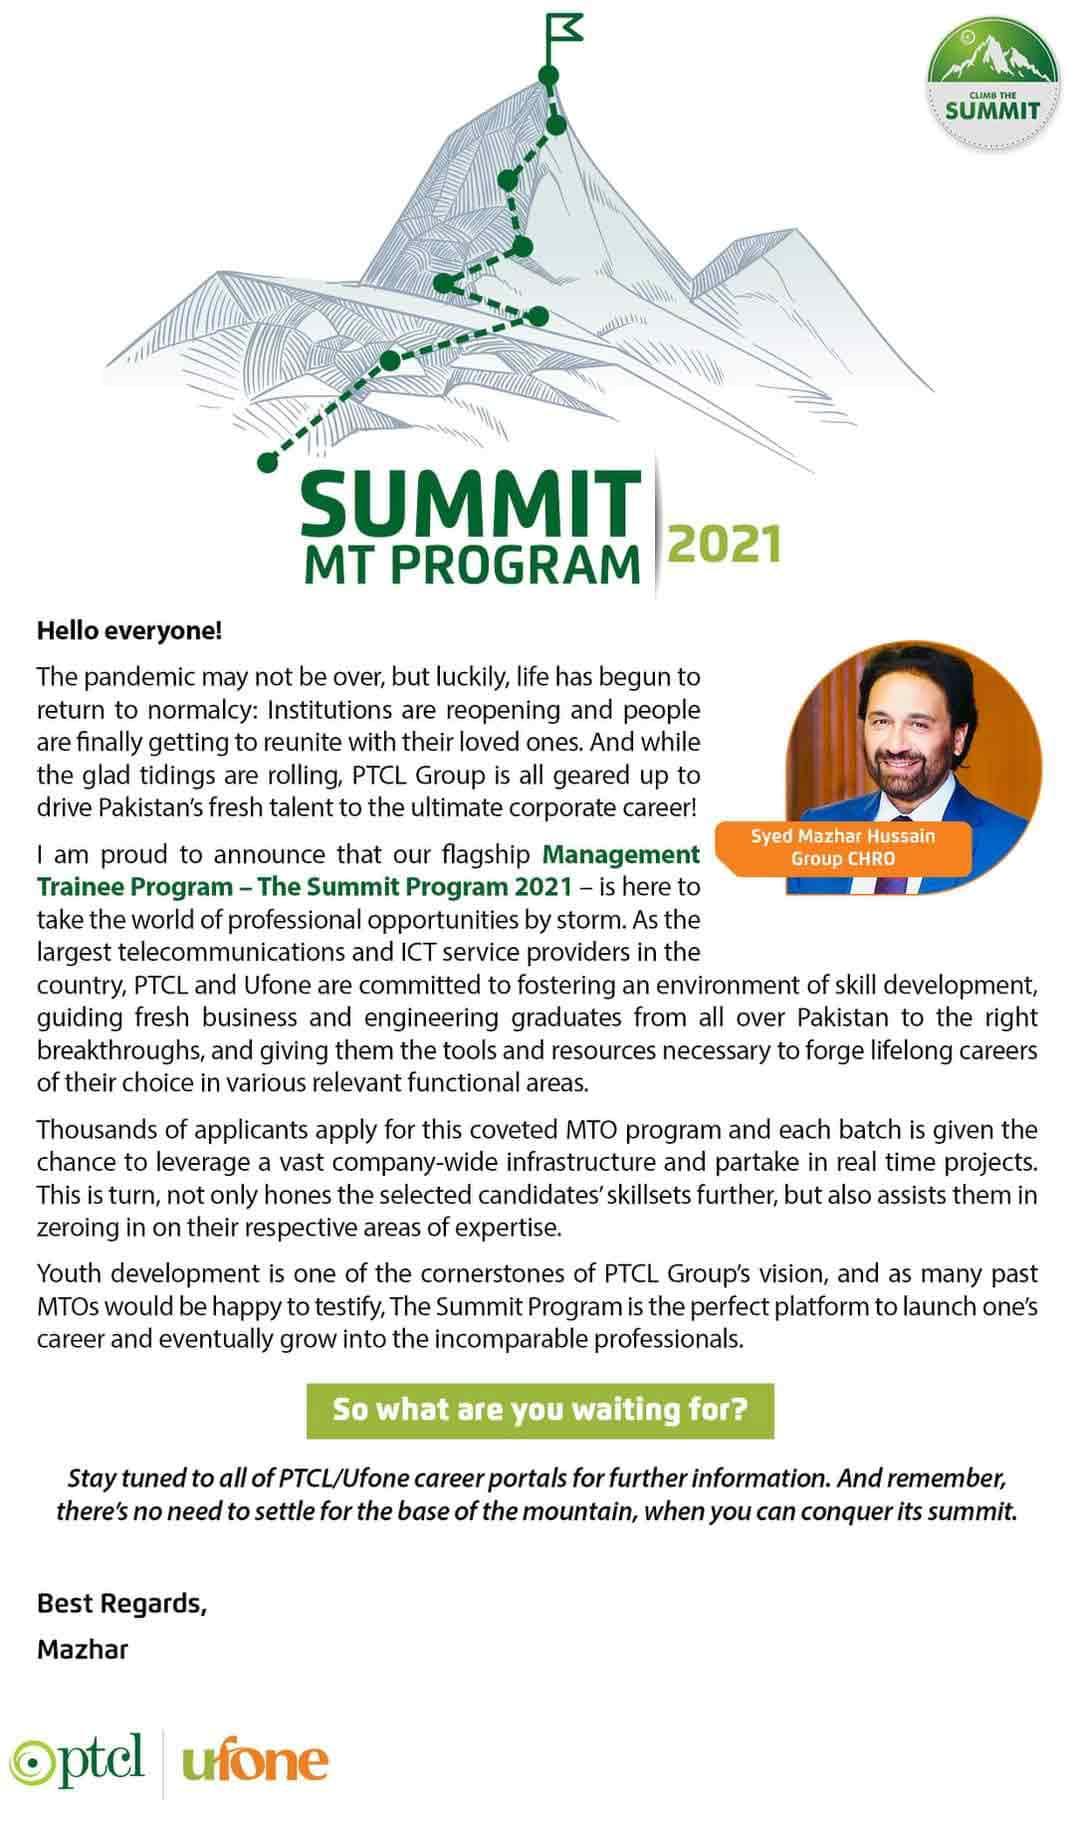 PTCL-Summit-Program-2021